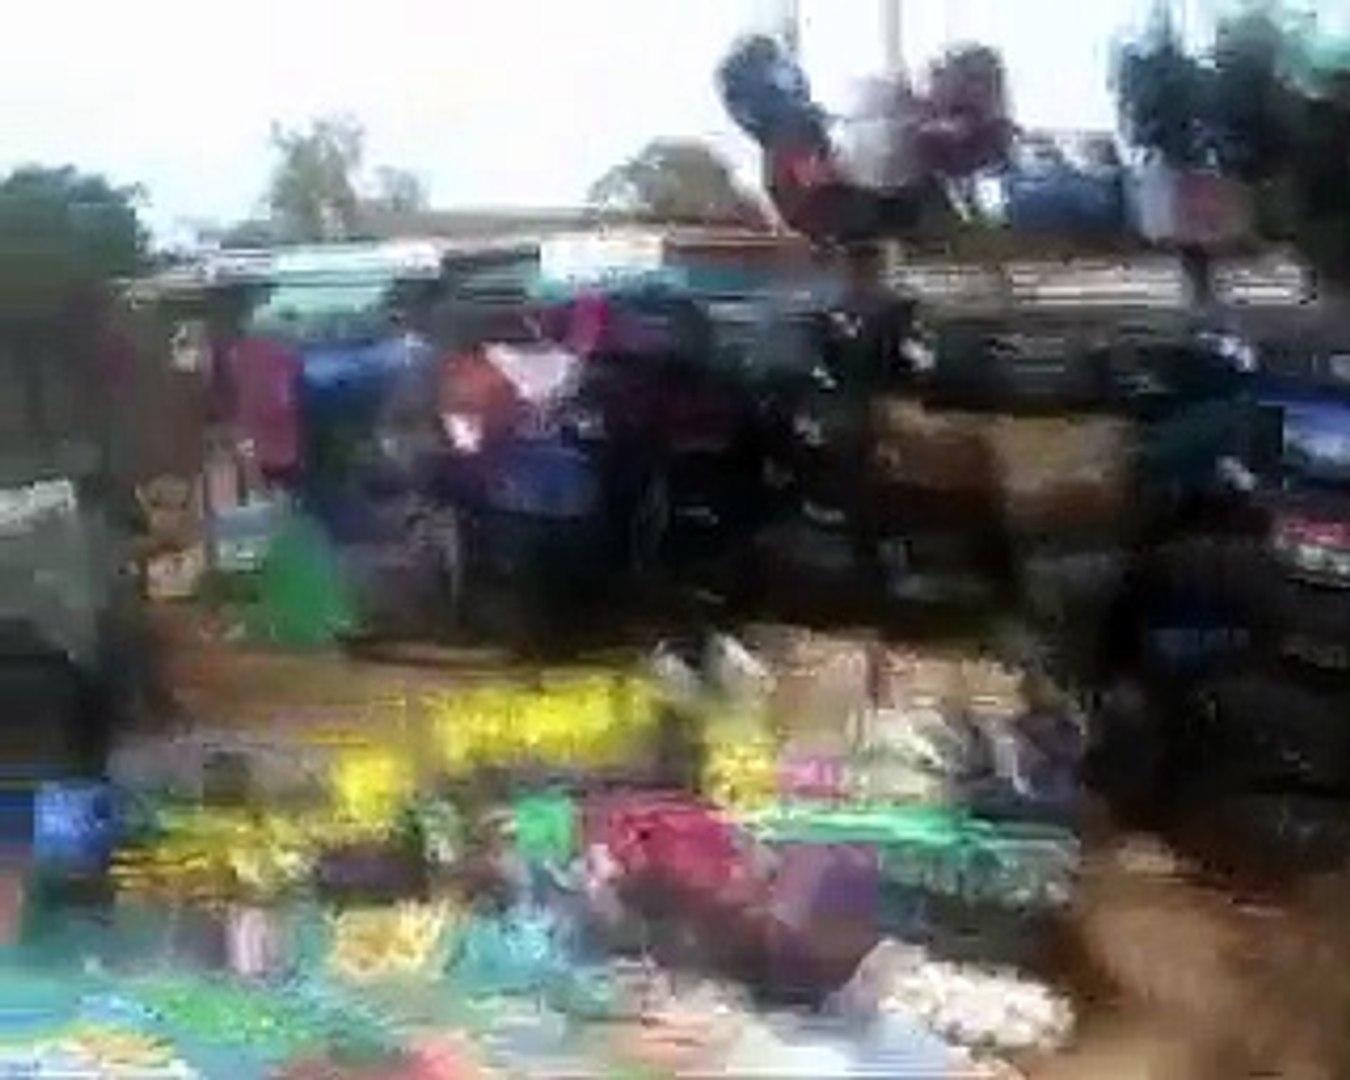 African roads